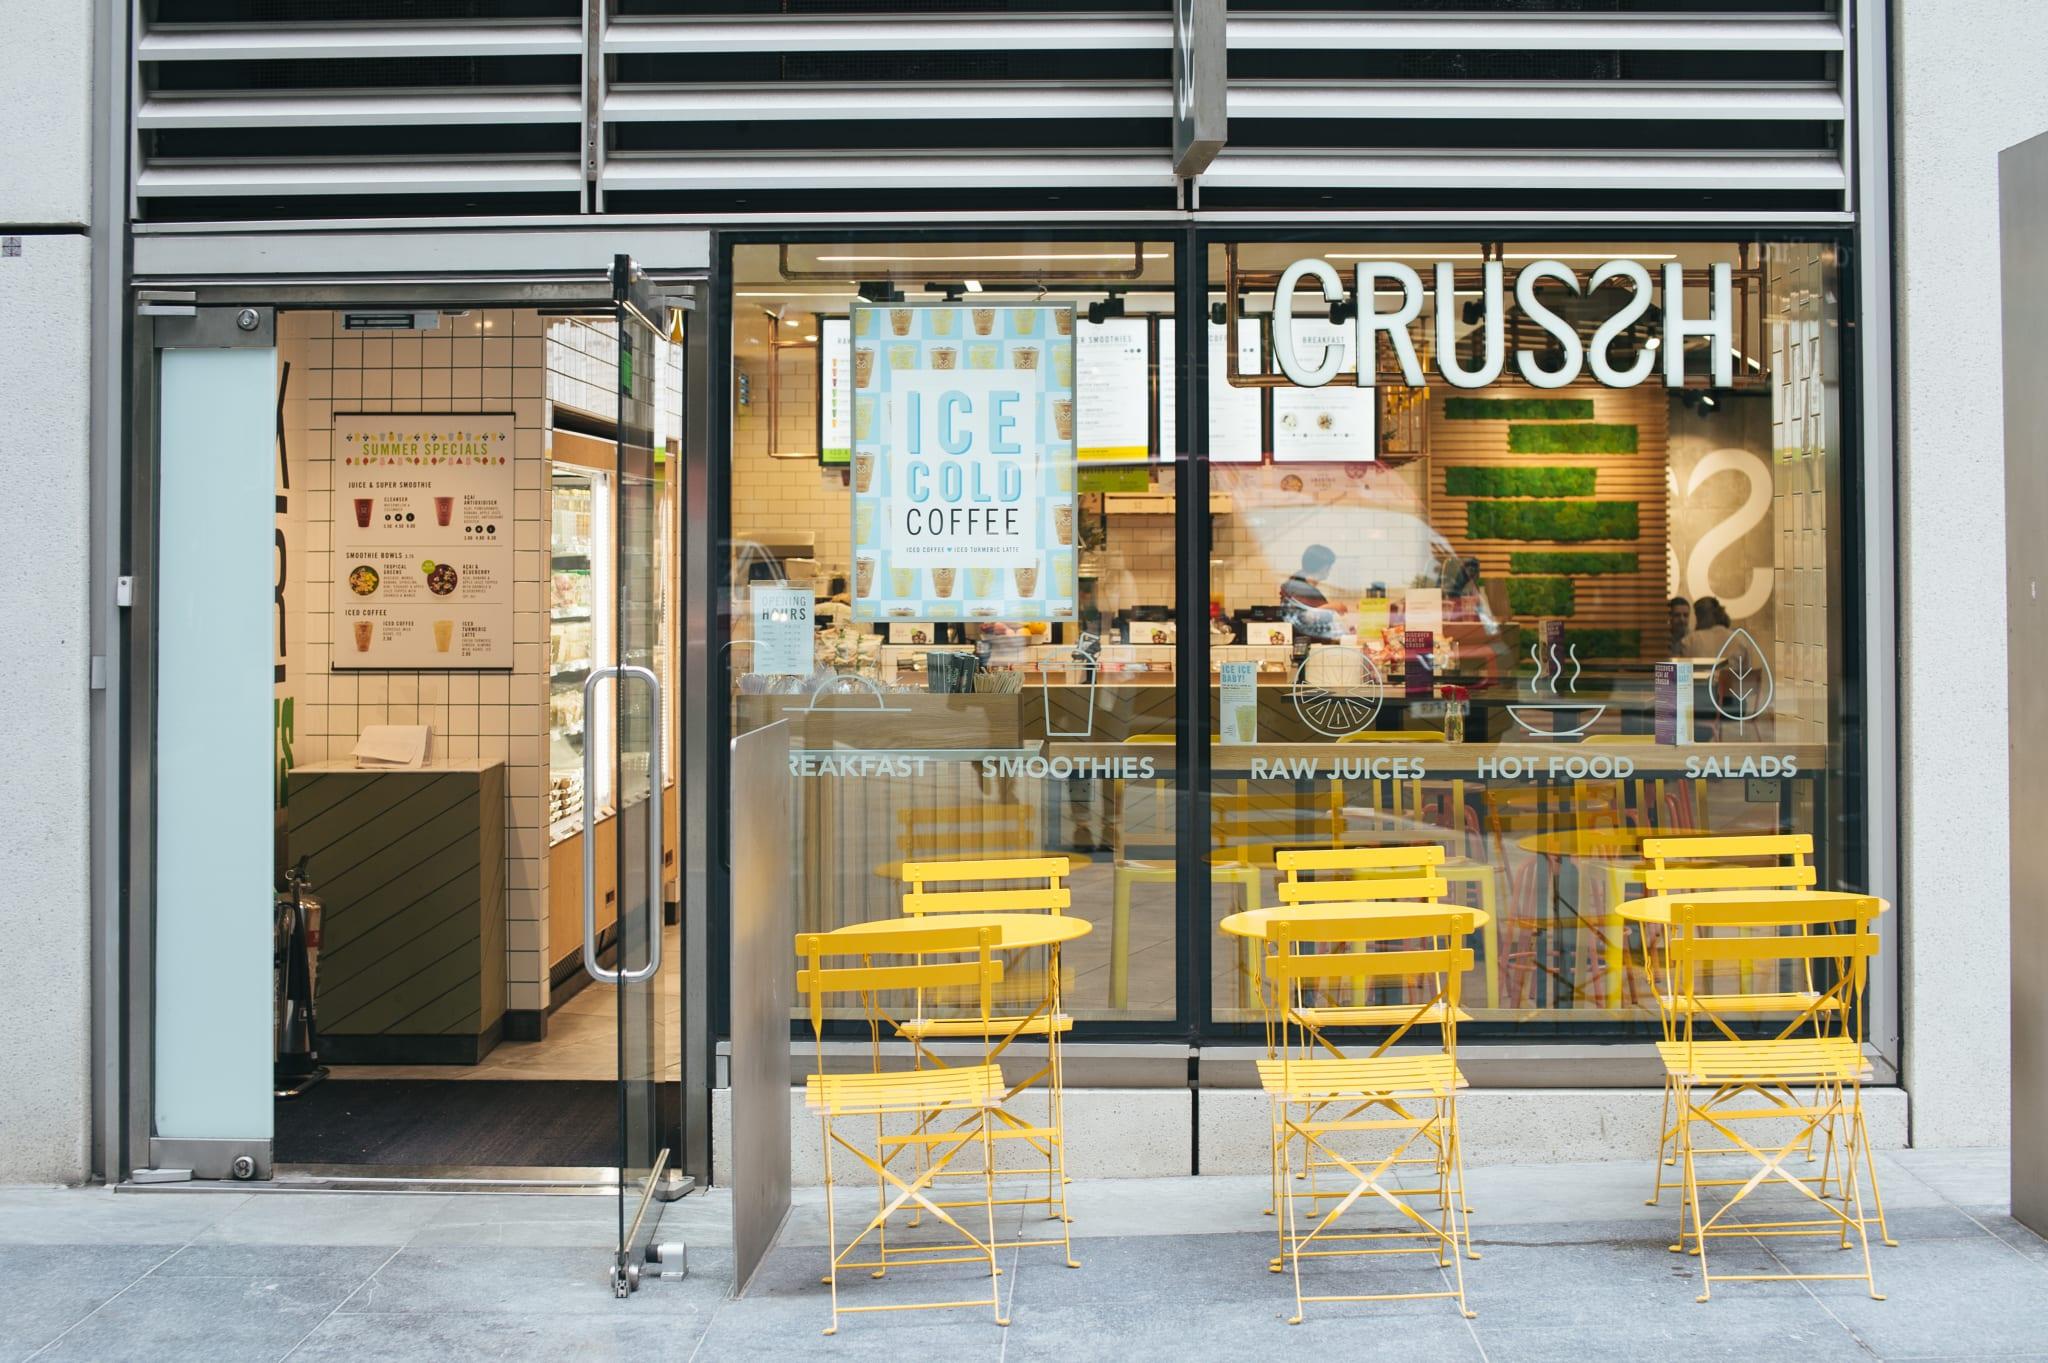 Crussh store